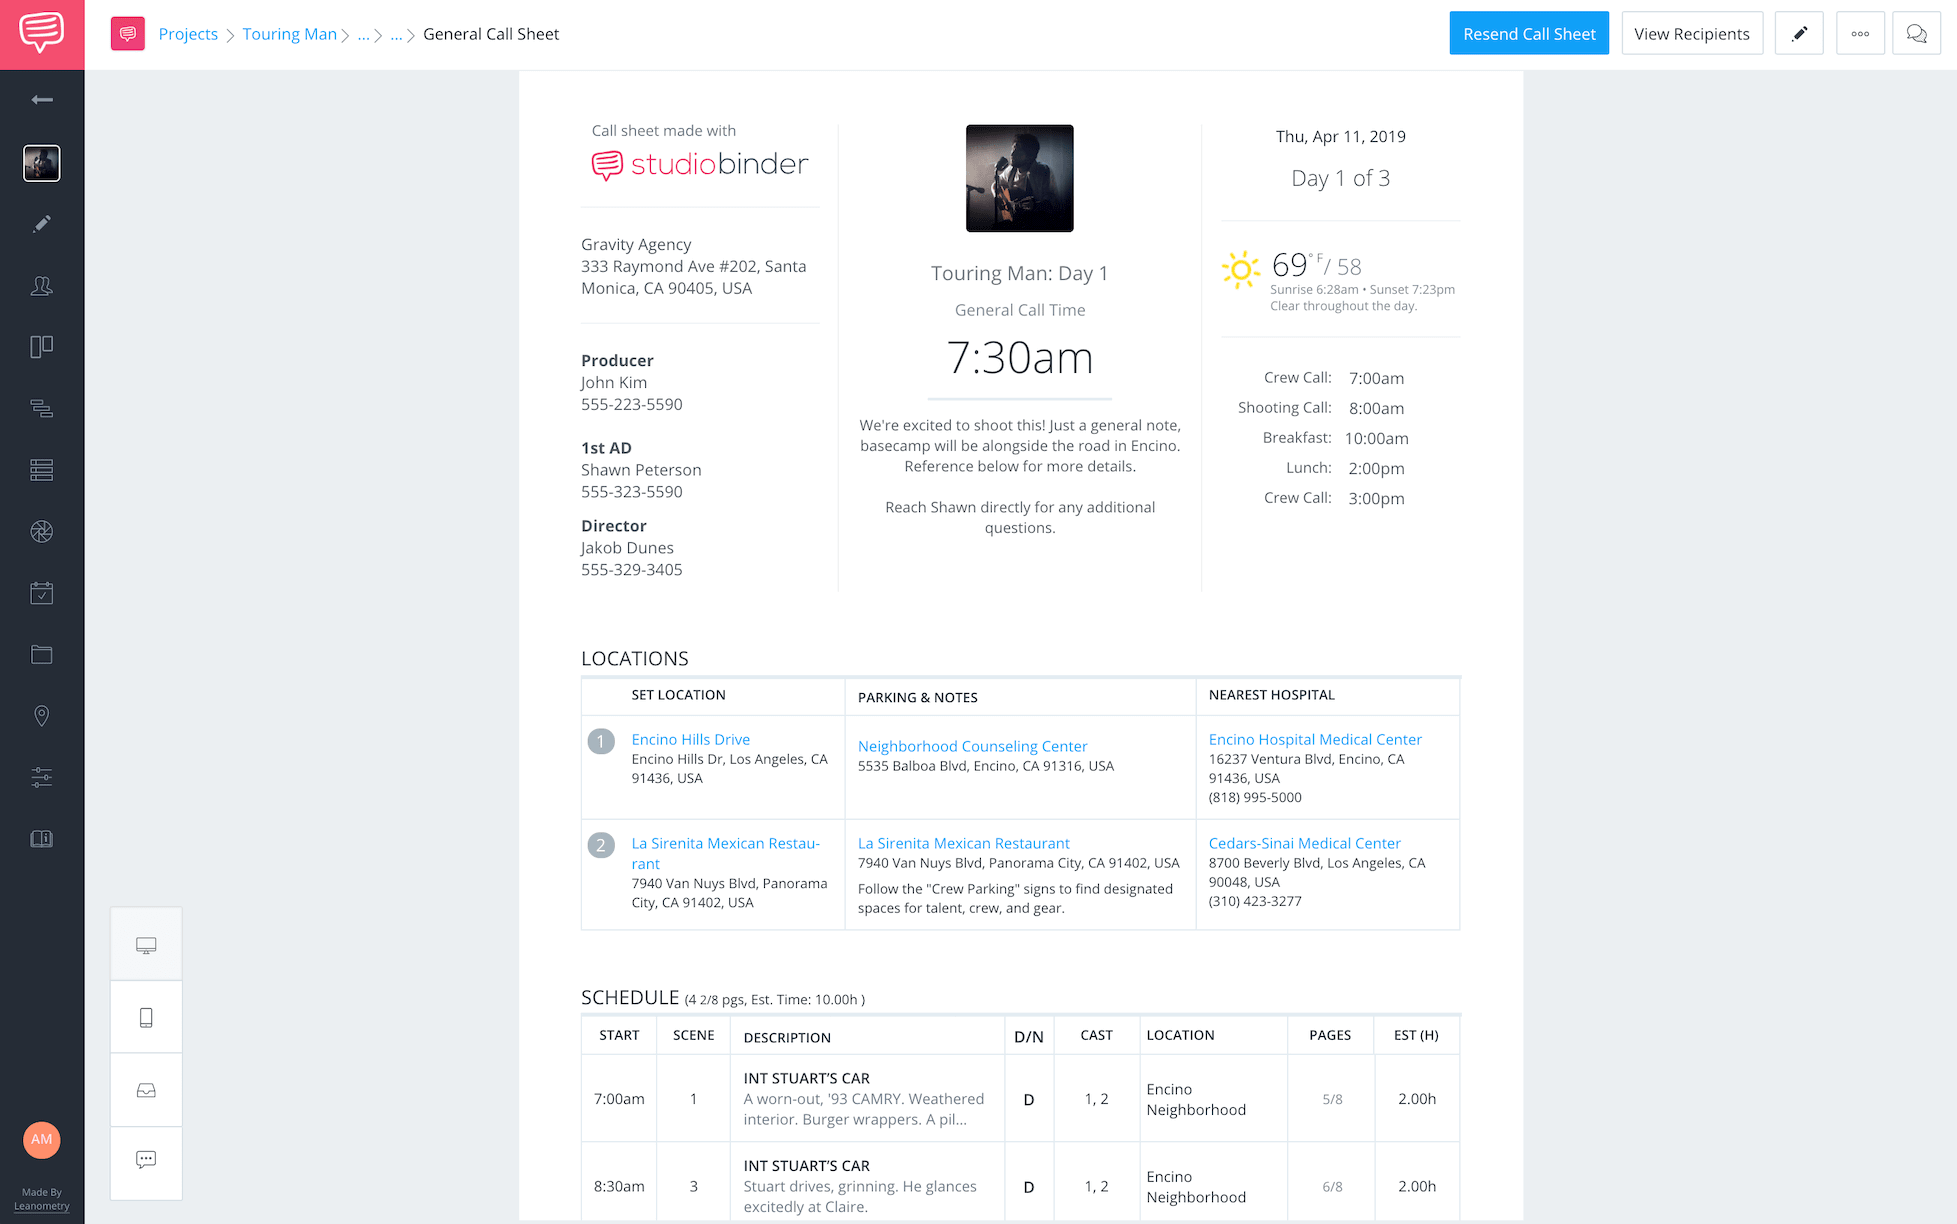 Larry Jordan Post Production Workflow Call Sheet